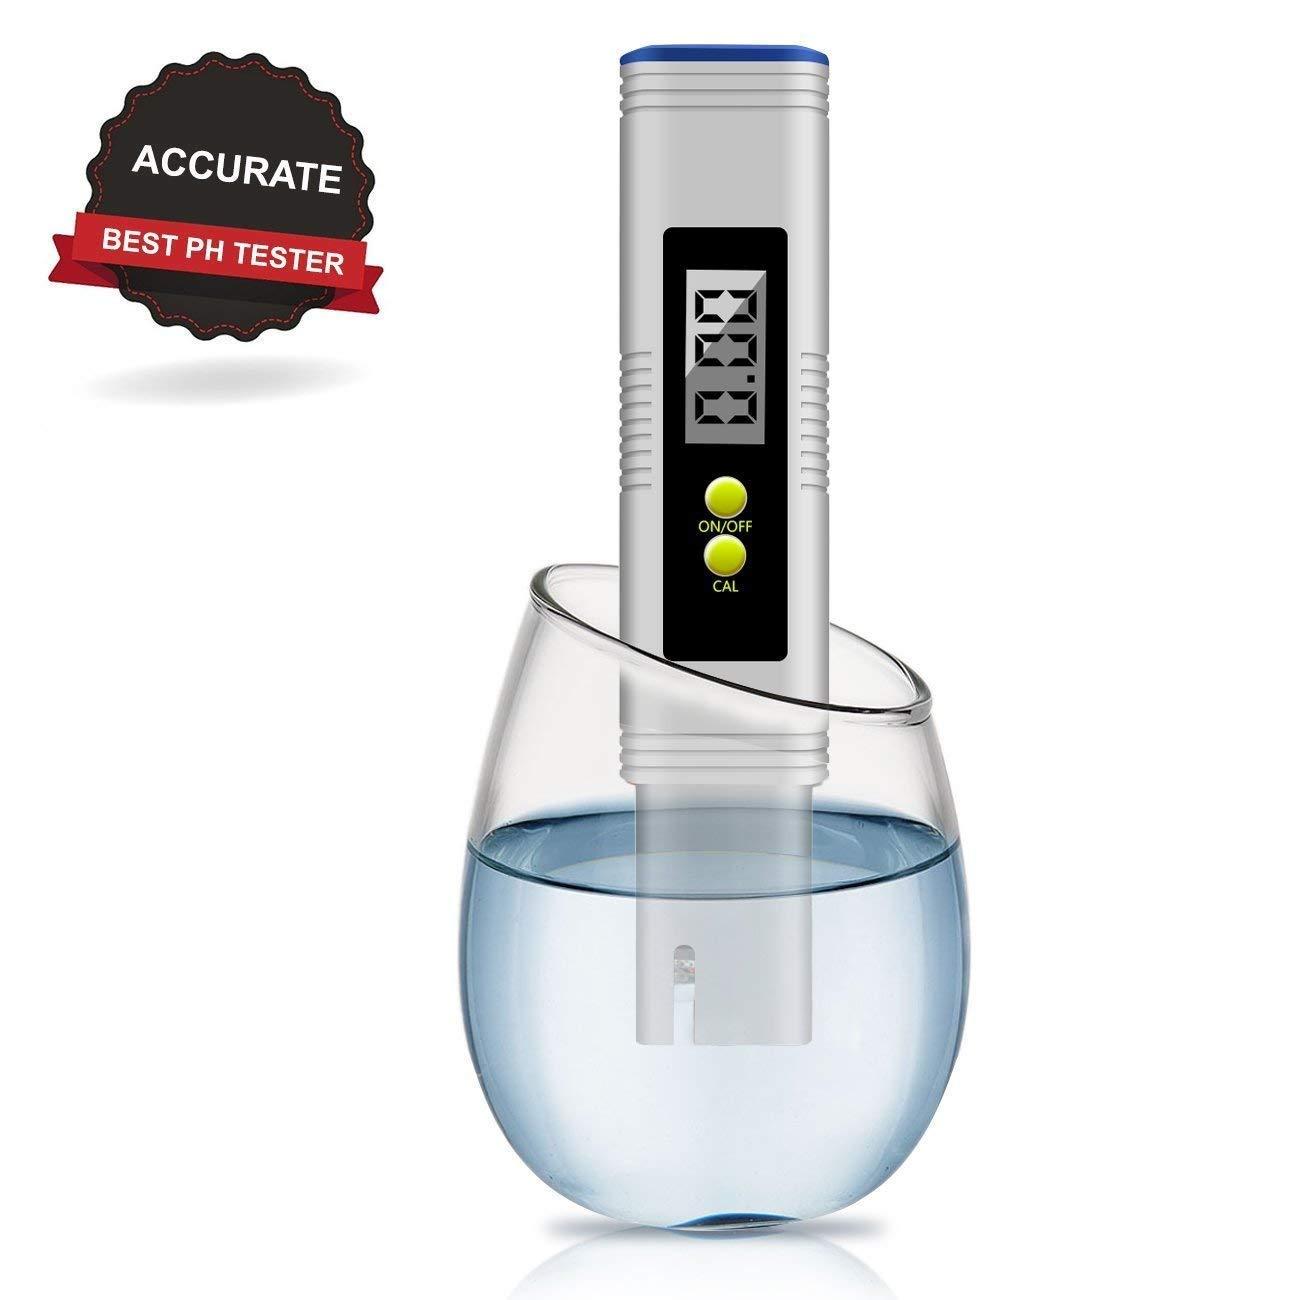 PH Meter, Digital PH Meter, PH Water Tester, PH Tester for Drinking Water/Garden/Farm/Lawn, Indoor & Outdoor JOKOO